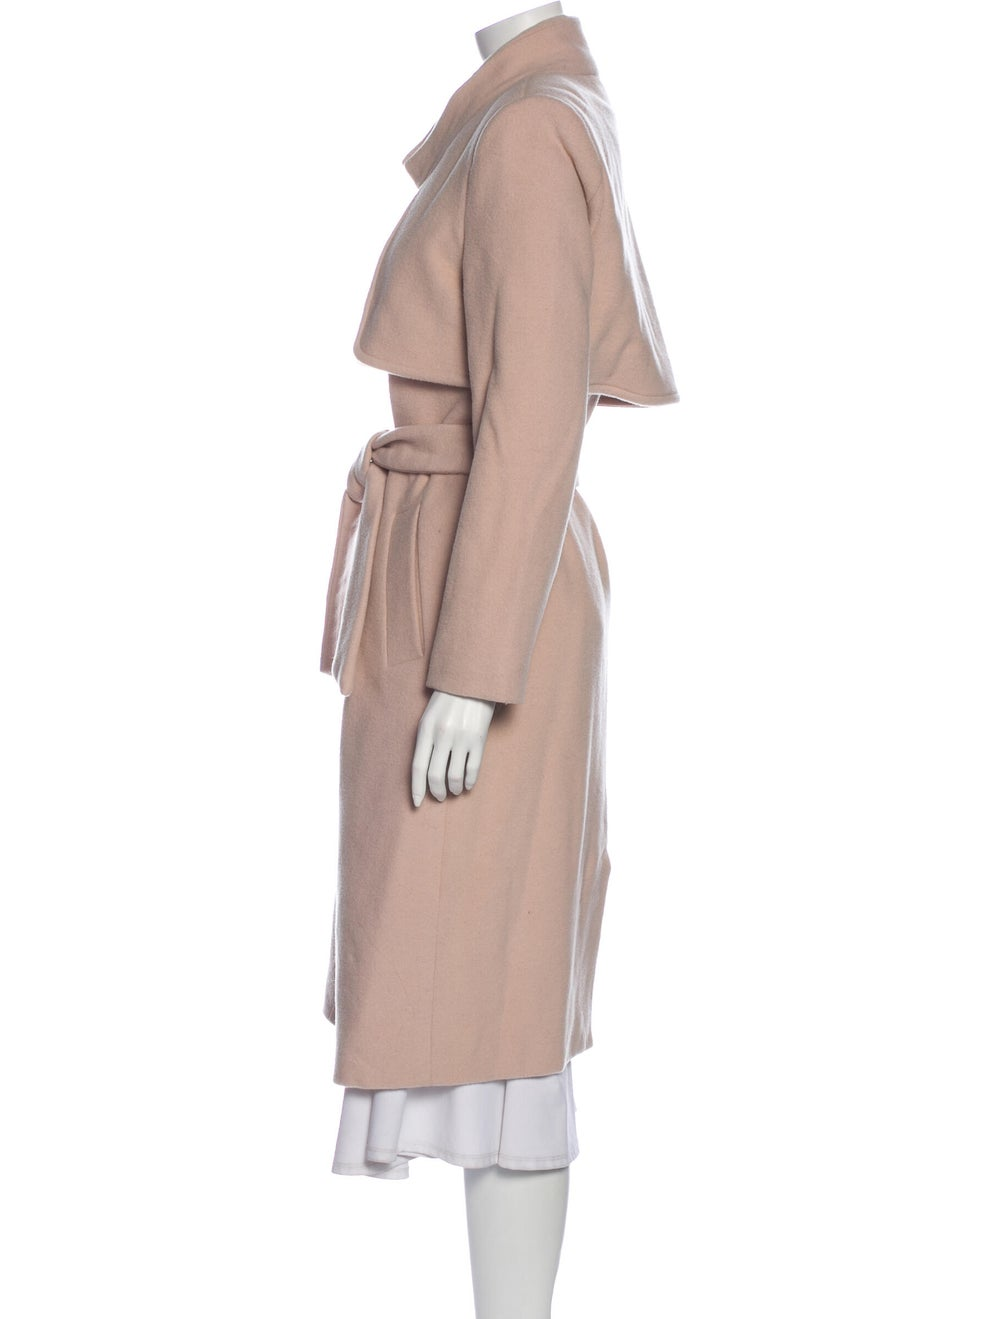 Halston Heritage Trench Coat Pink - image 2